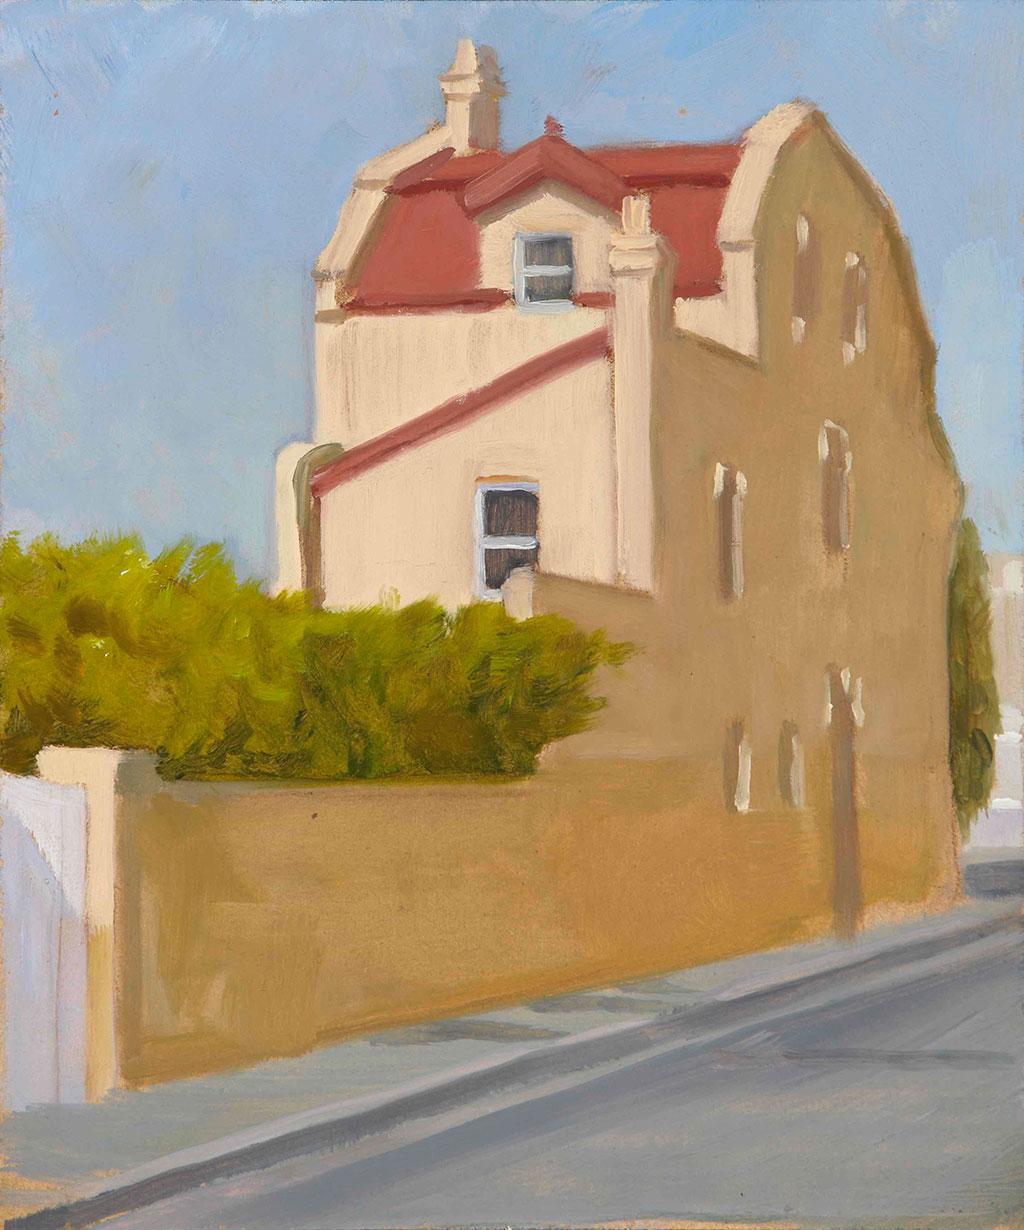 Corner-House-Bondi-30x20cm-oil_timber-2013